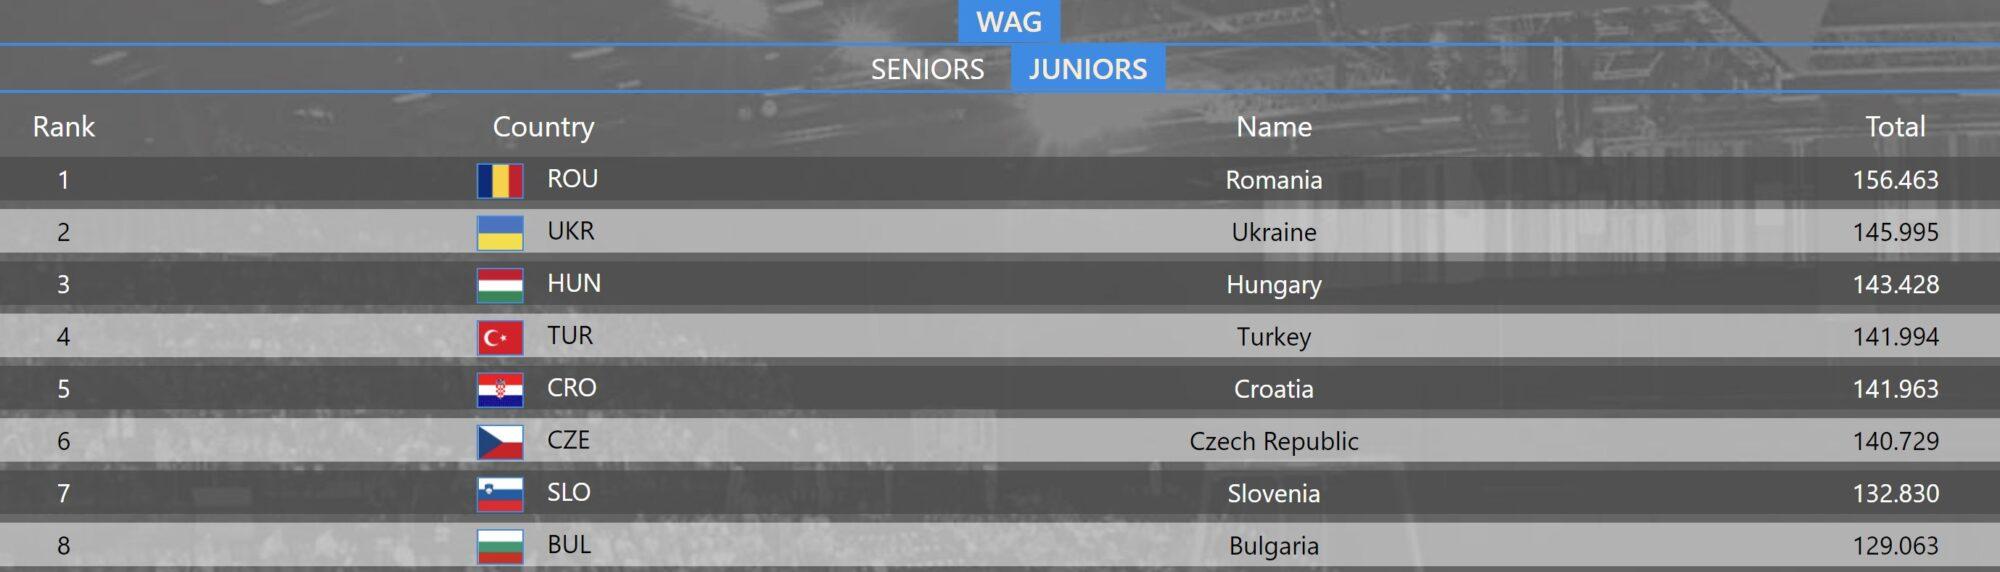 Жіноча юніорська збірна України стала віце-чемпіоном Європи - чемпіонат Європи, срібло, гімнастика, бронза - Epht9rVXYAE5hLc 2000x572